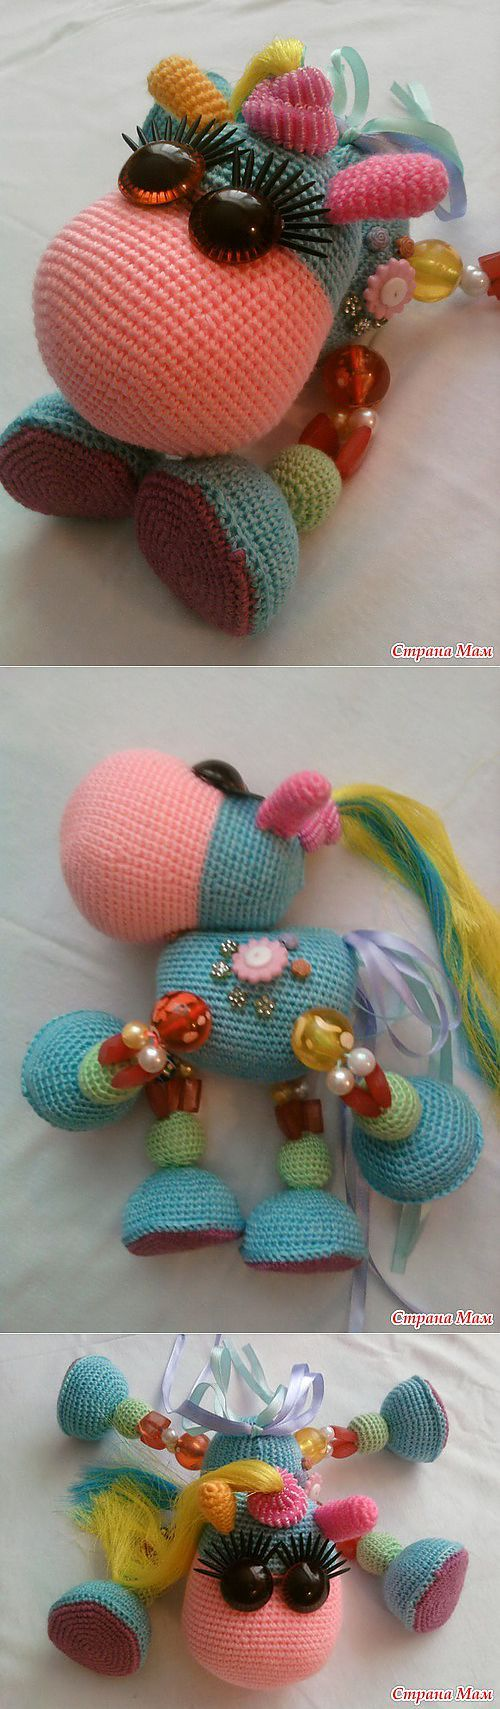 131 Best images about unicornio amigurumi on Pinterest ...